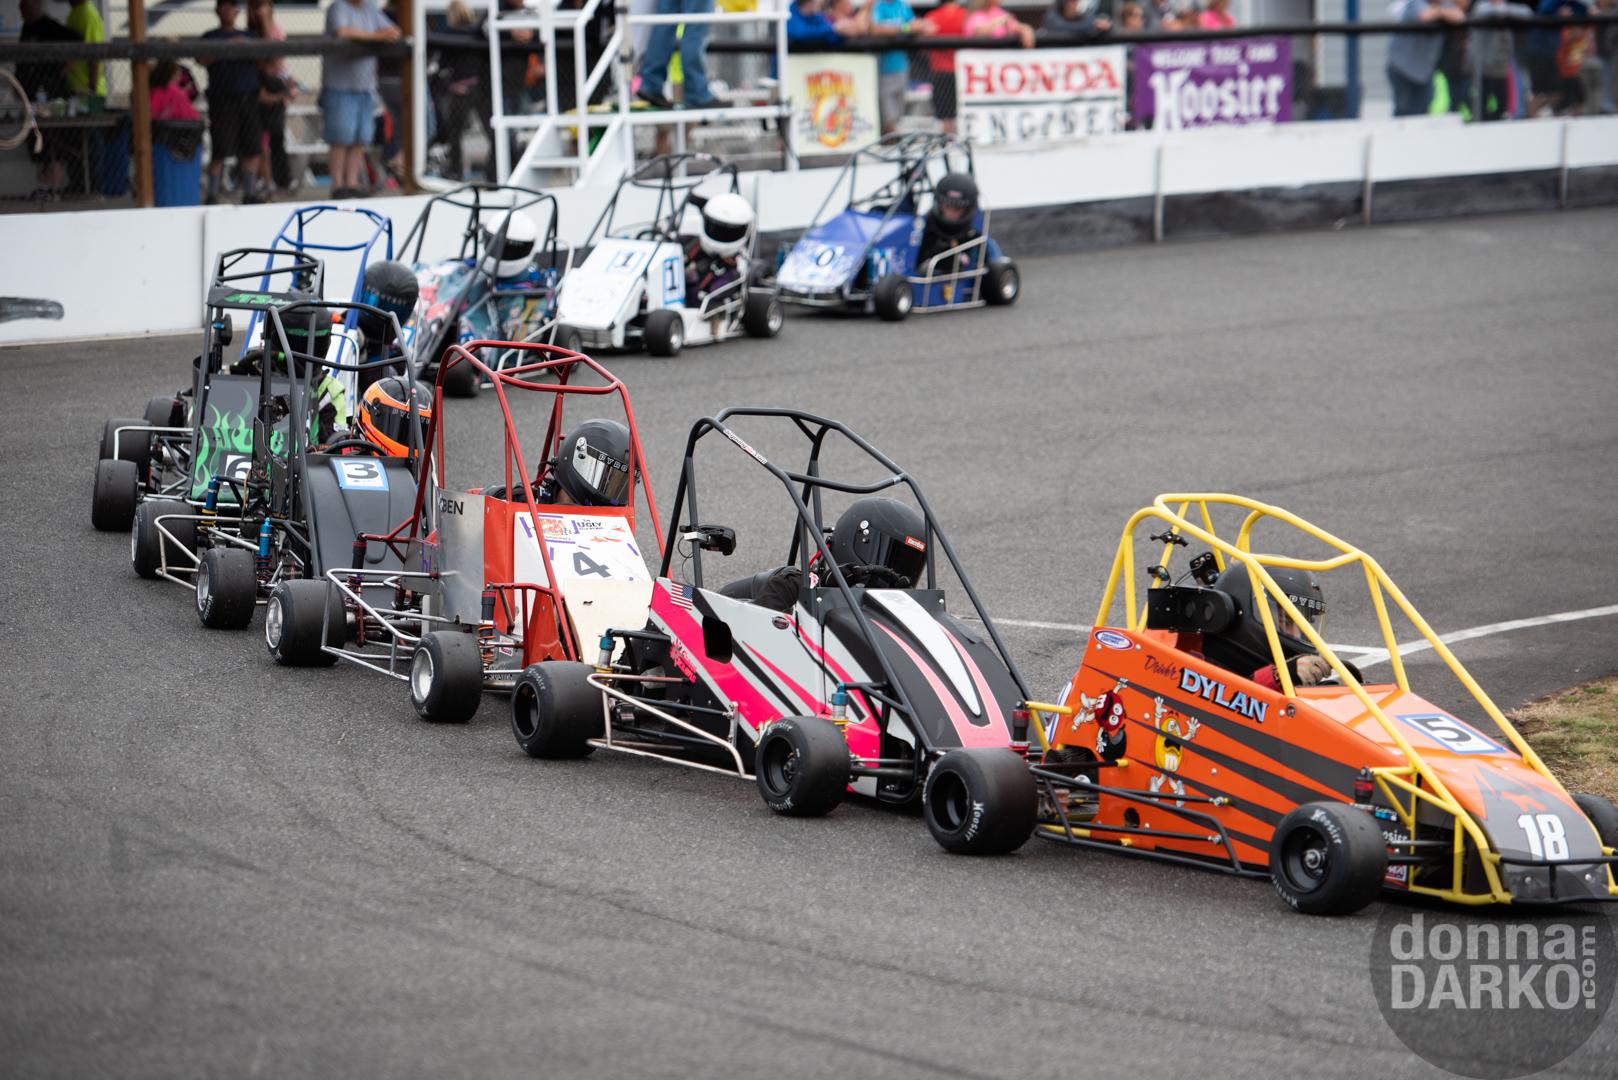 QWMA (Racing) 8-11-2019 DSC_6557.jpg